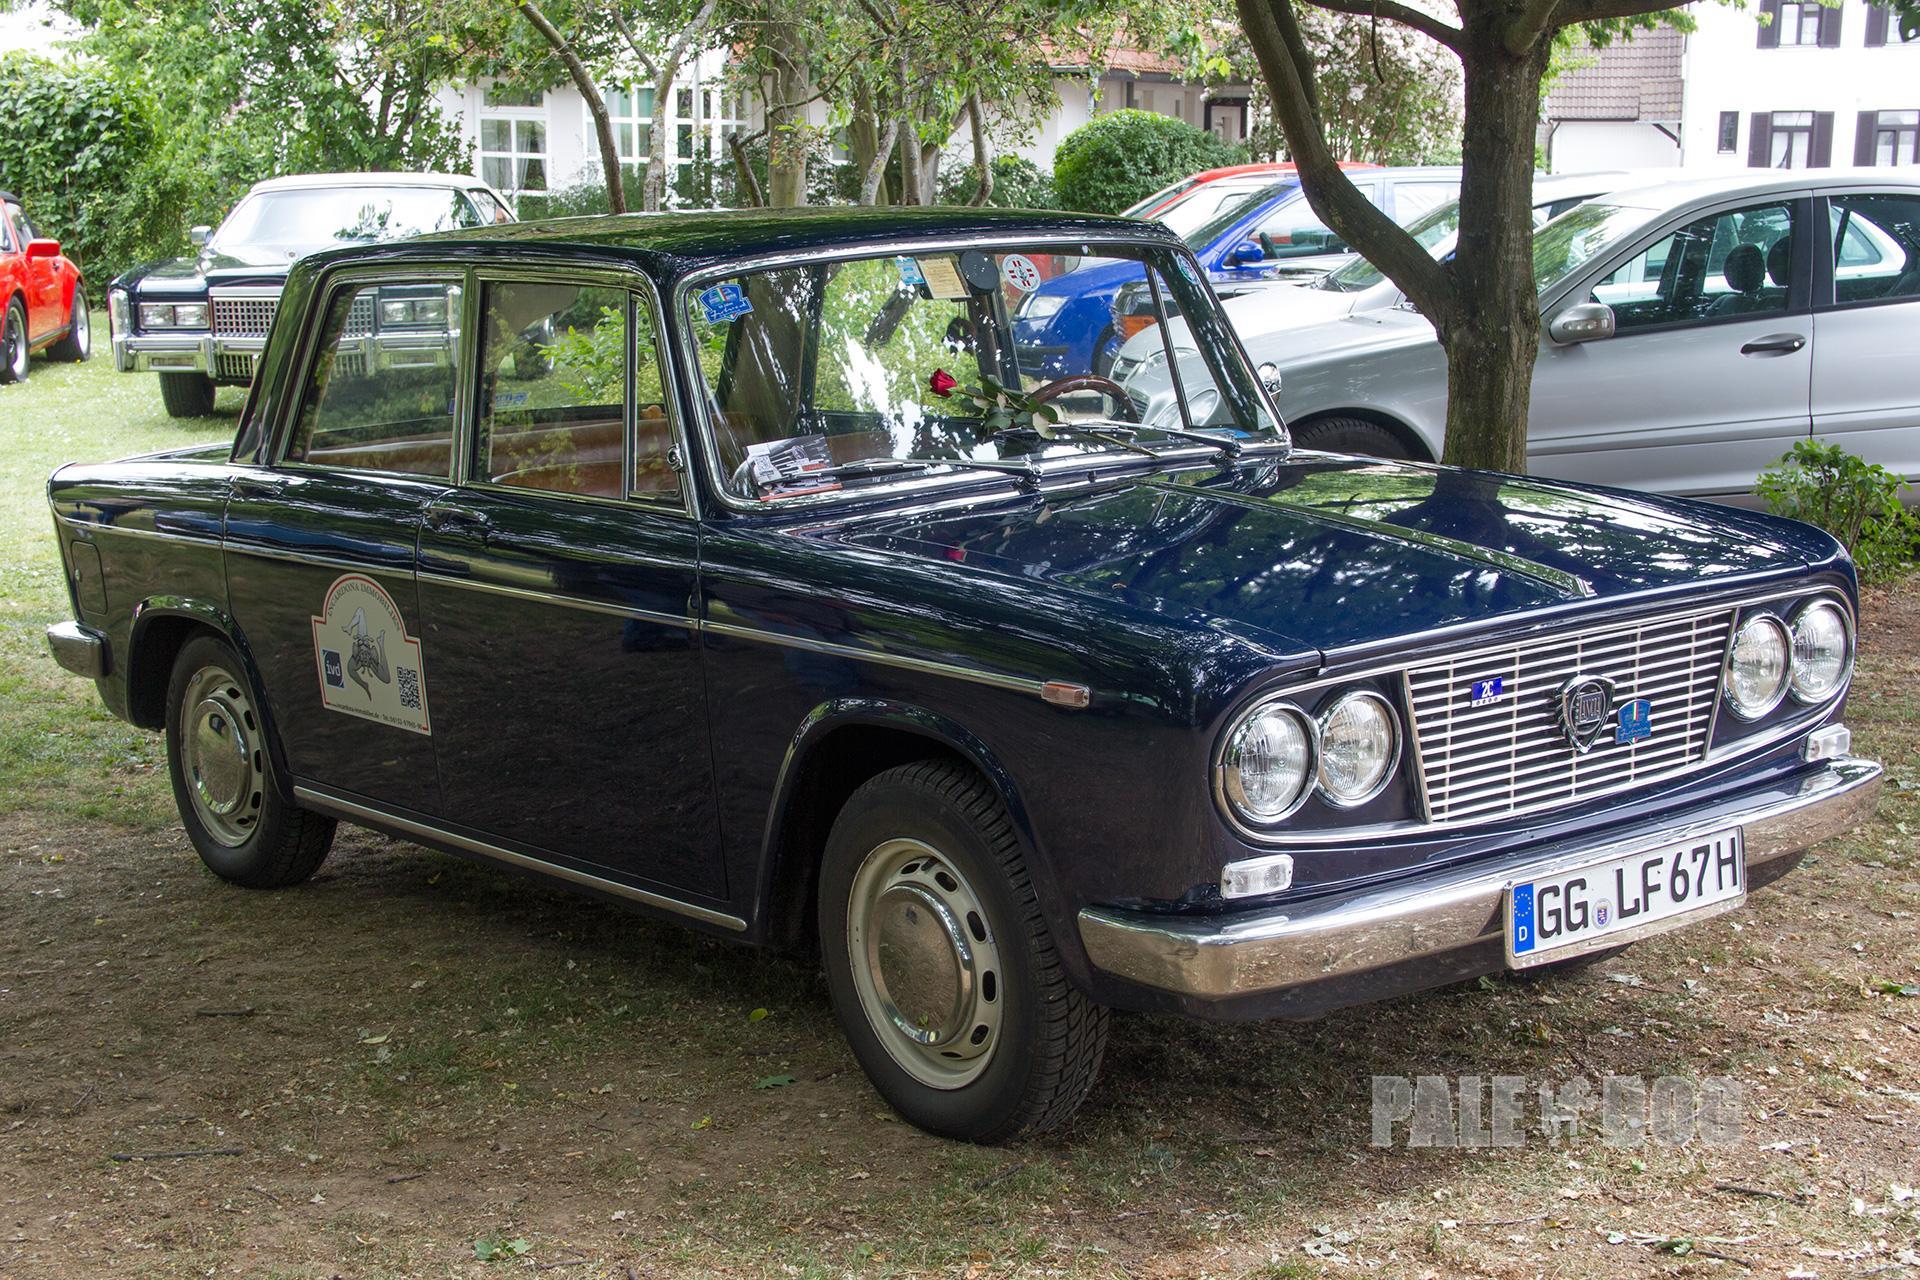 Lancia paledog photo collection 1967 lancia fulvia 2c berlina front view vanachro Image collections